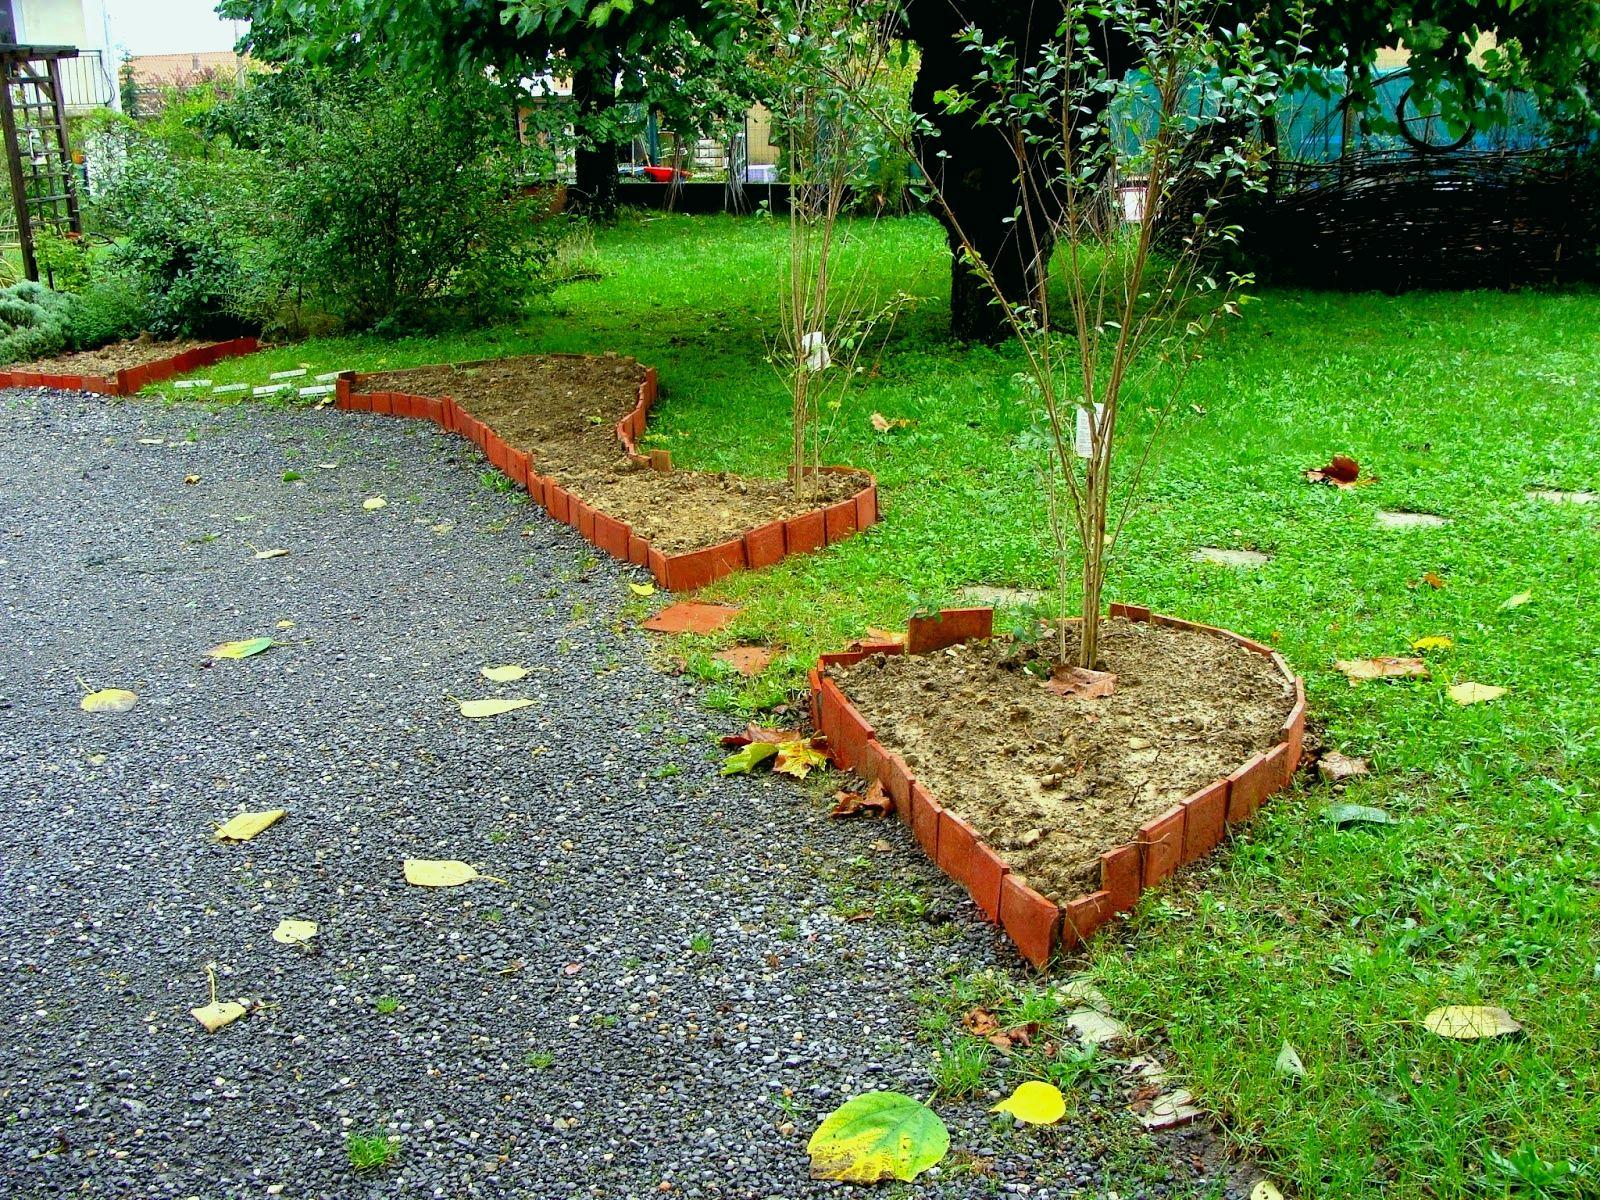 Bordures De Jardin Moderne Nouveau Collection Brique Bordure Jardin Impressionnant Bordure De Jardin